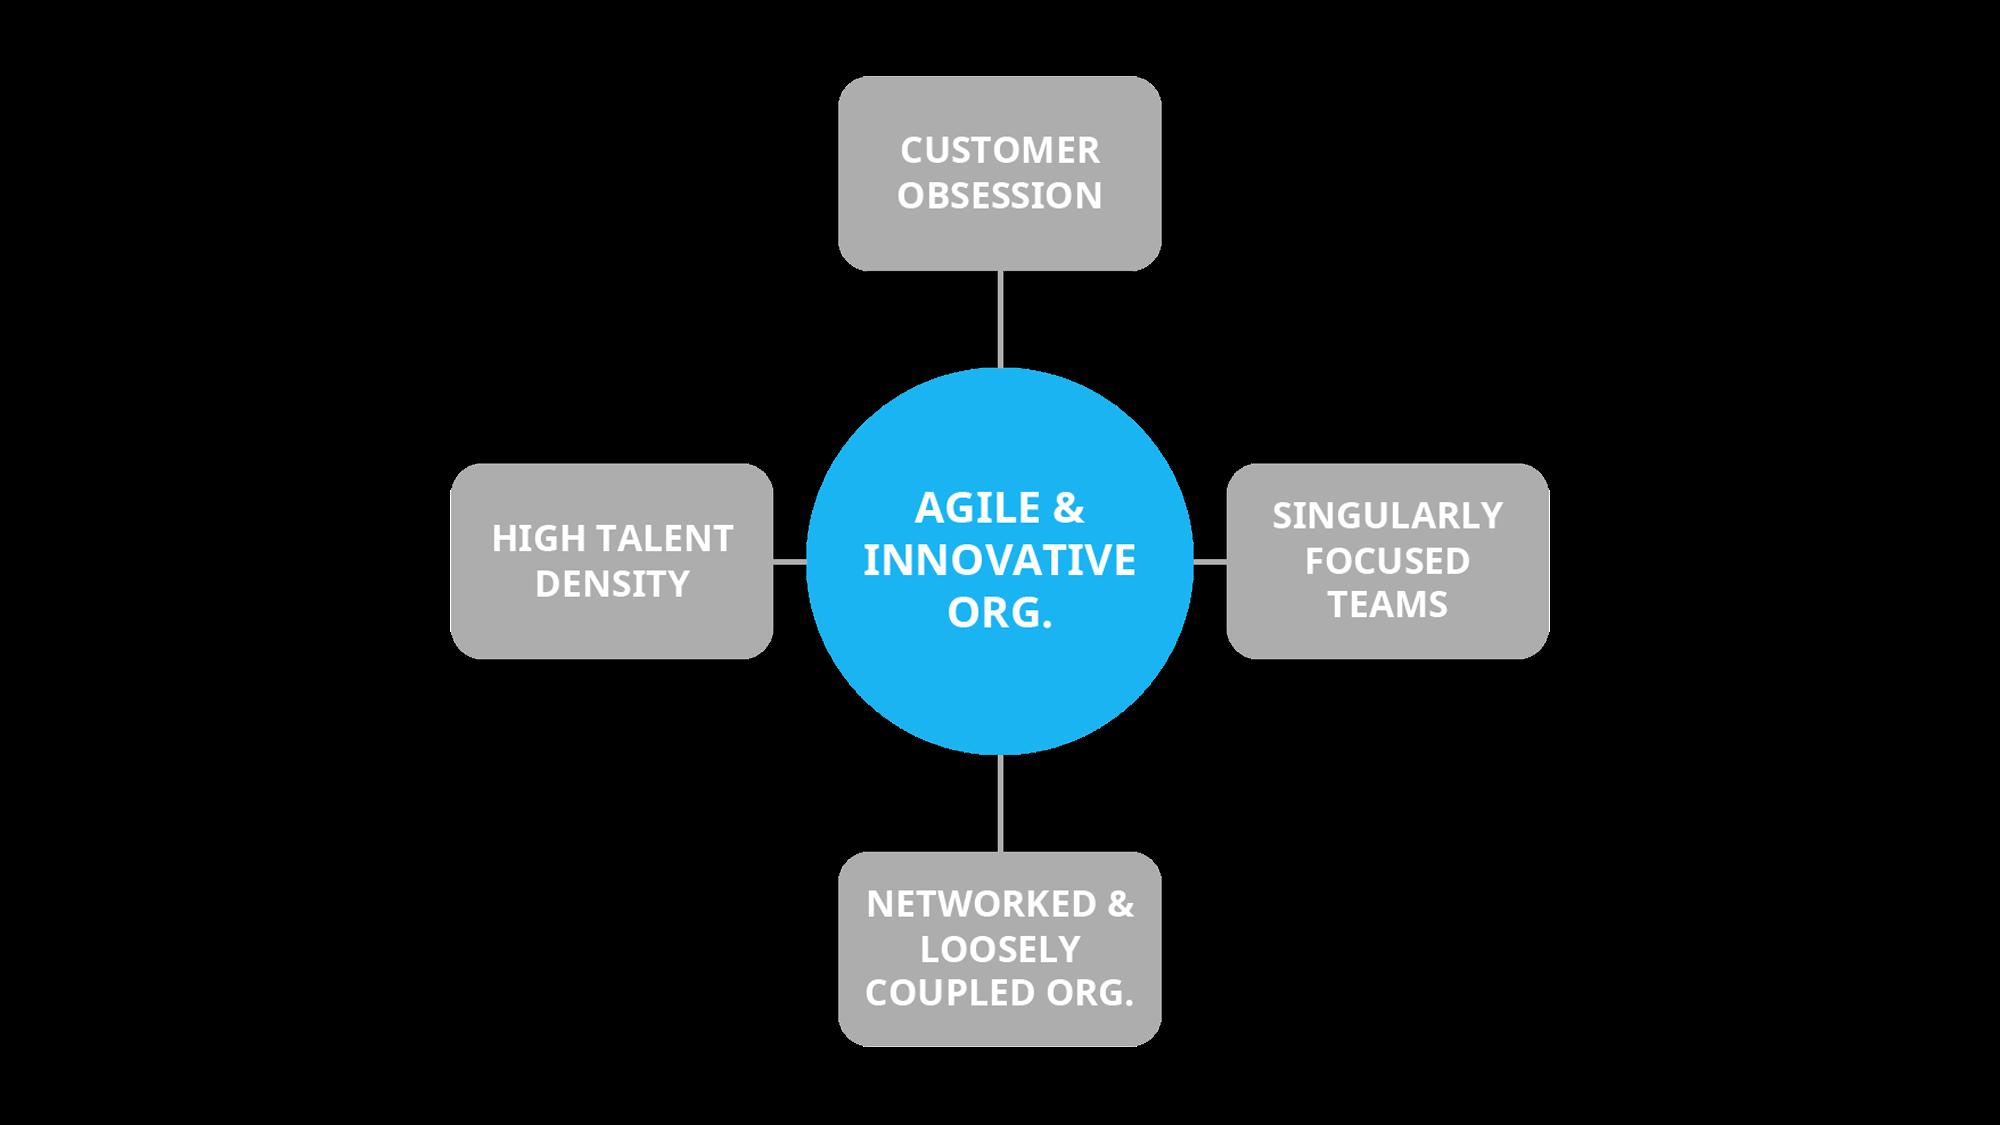 Key principles of an agile and innovative organization